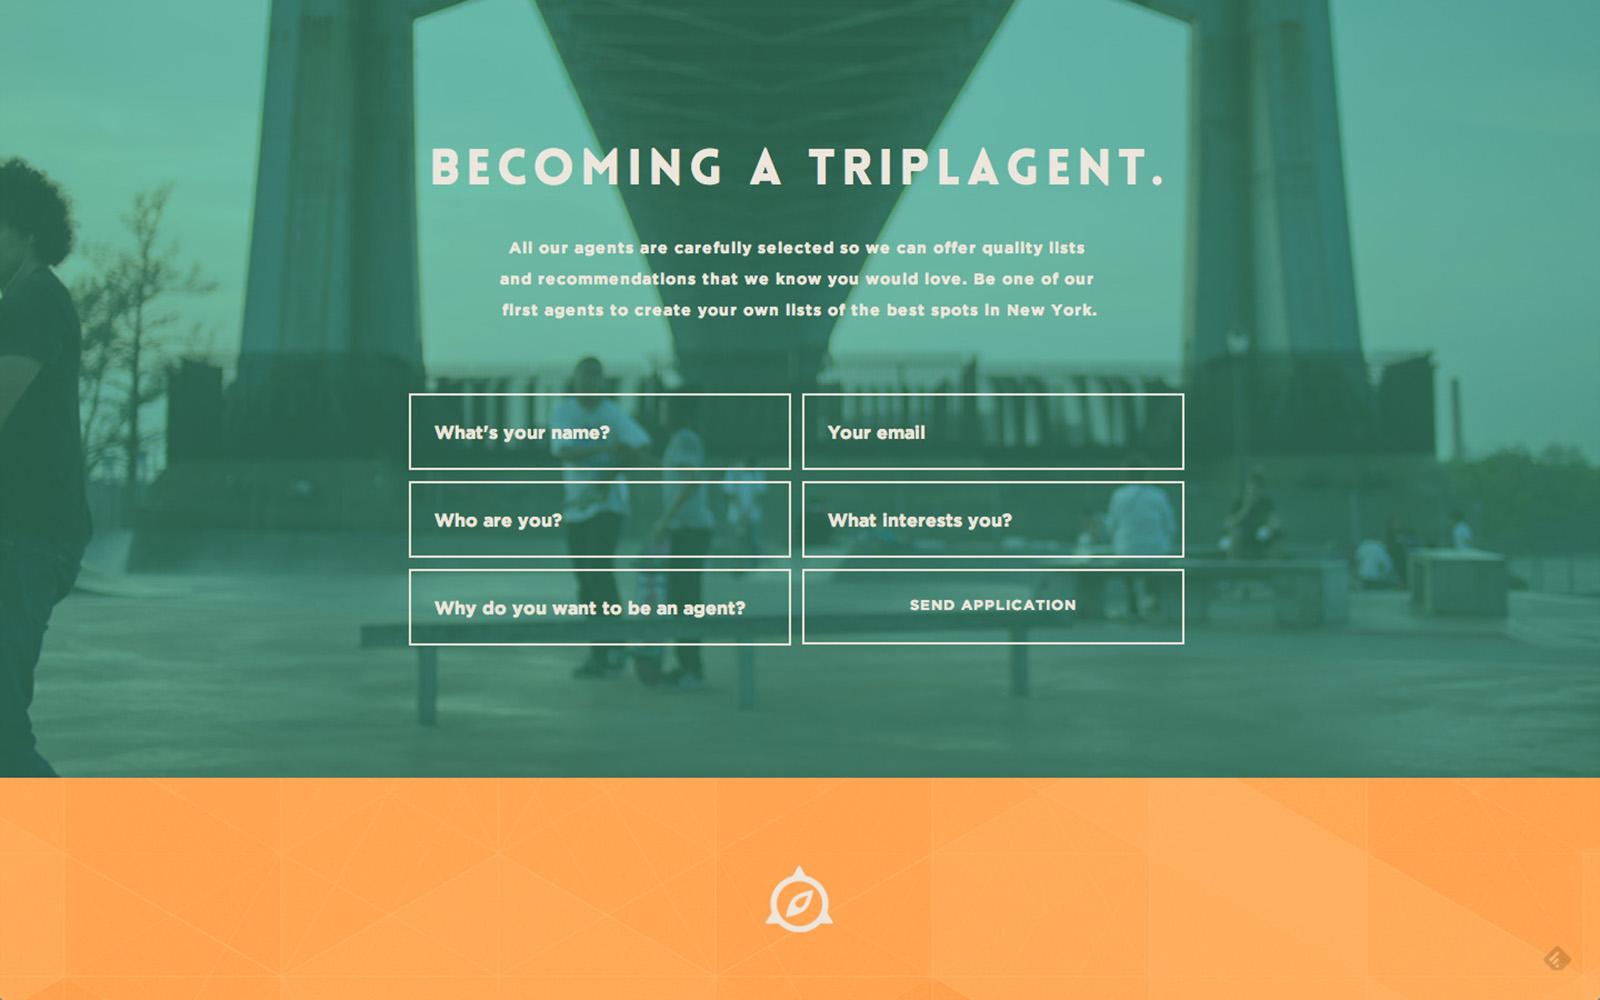 TriplAgent_1.jpg